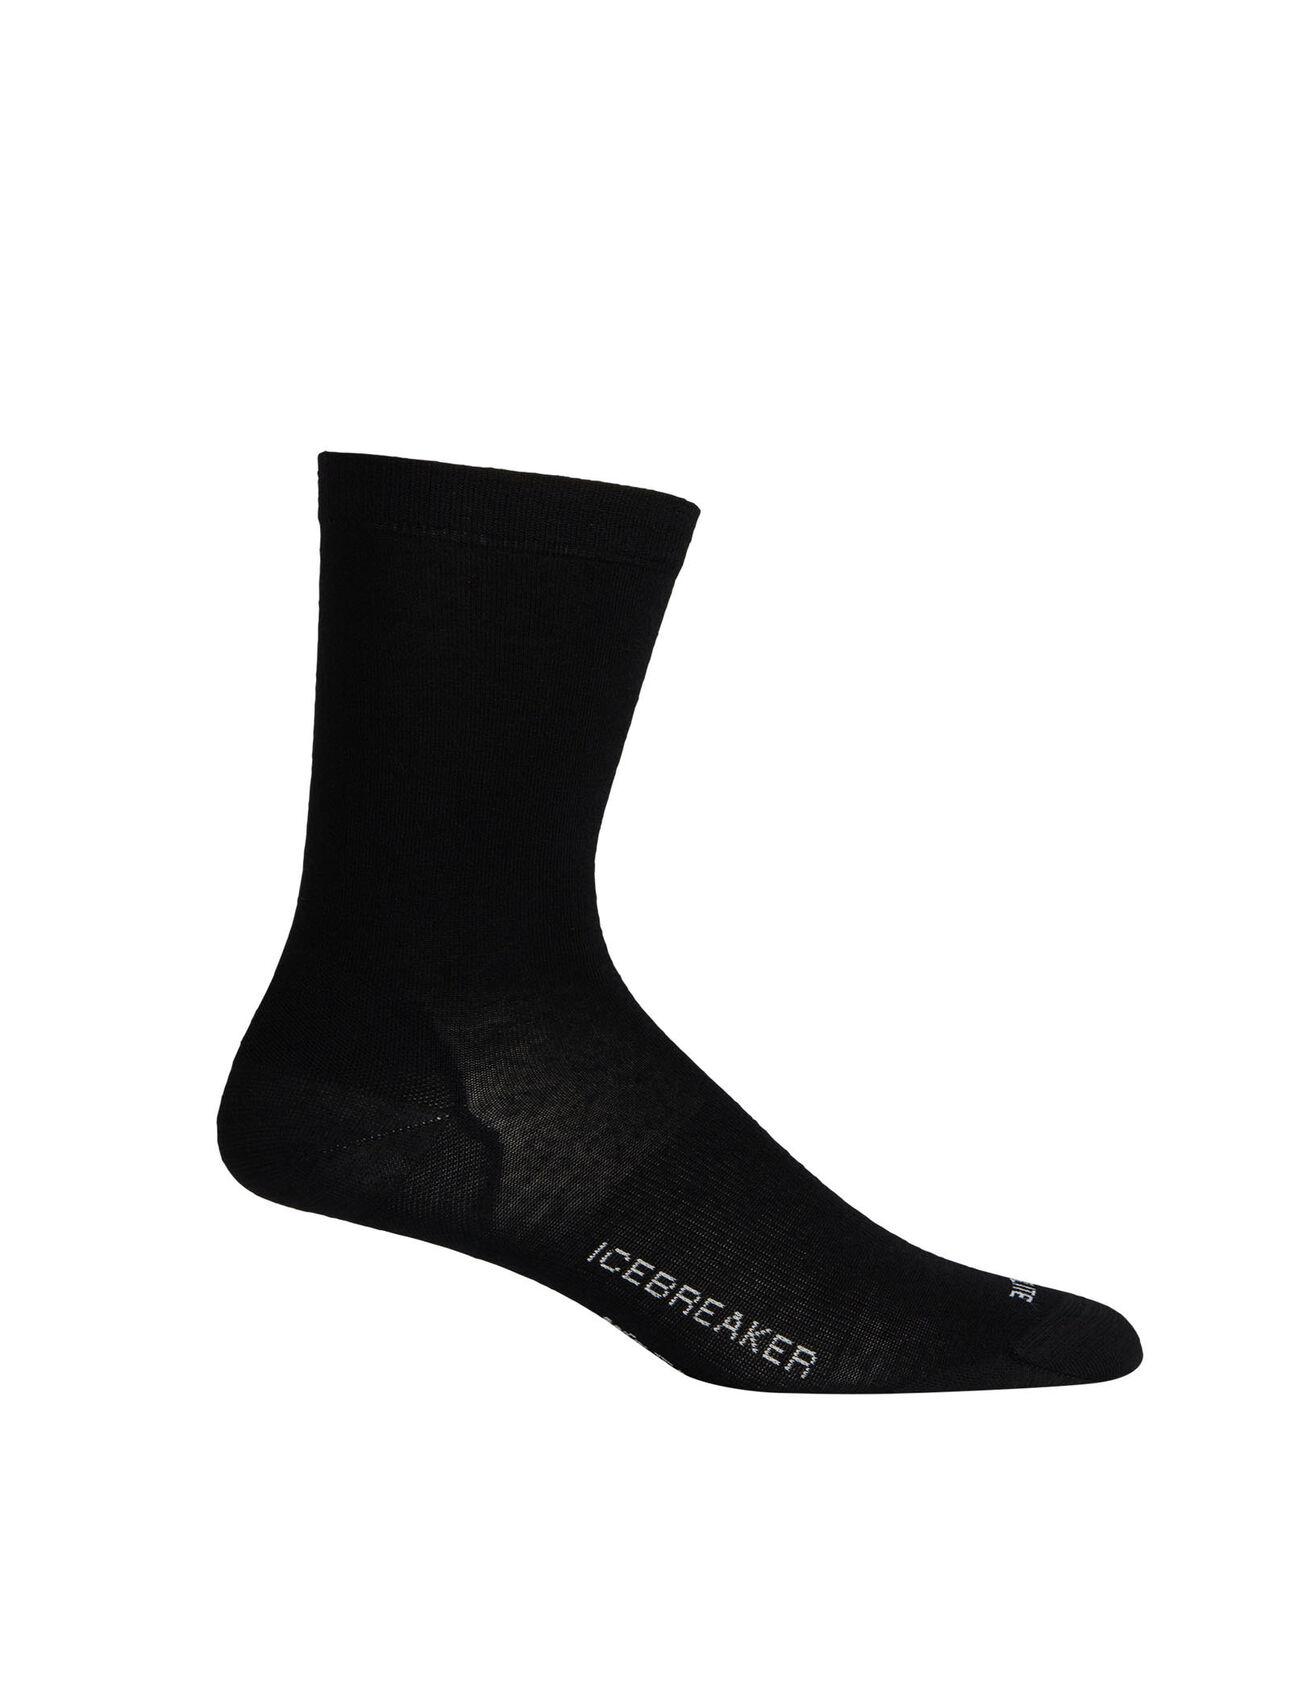 Cool-Lite™ Merino Lifestyle Crew Socks